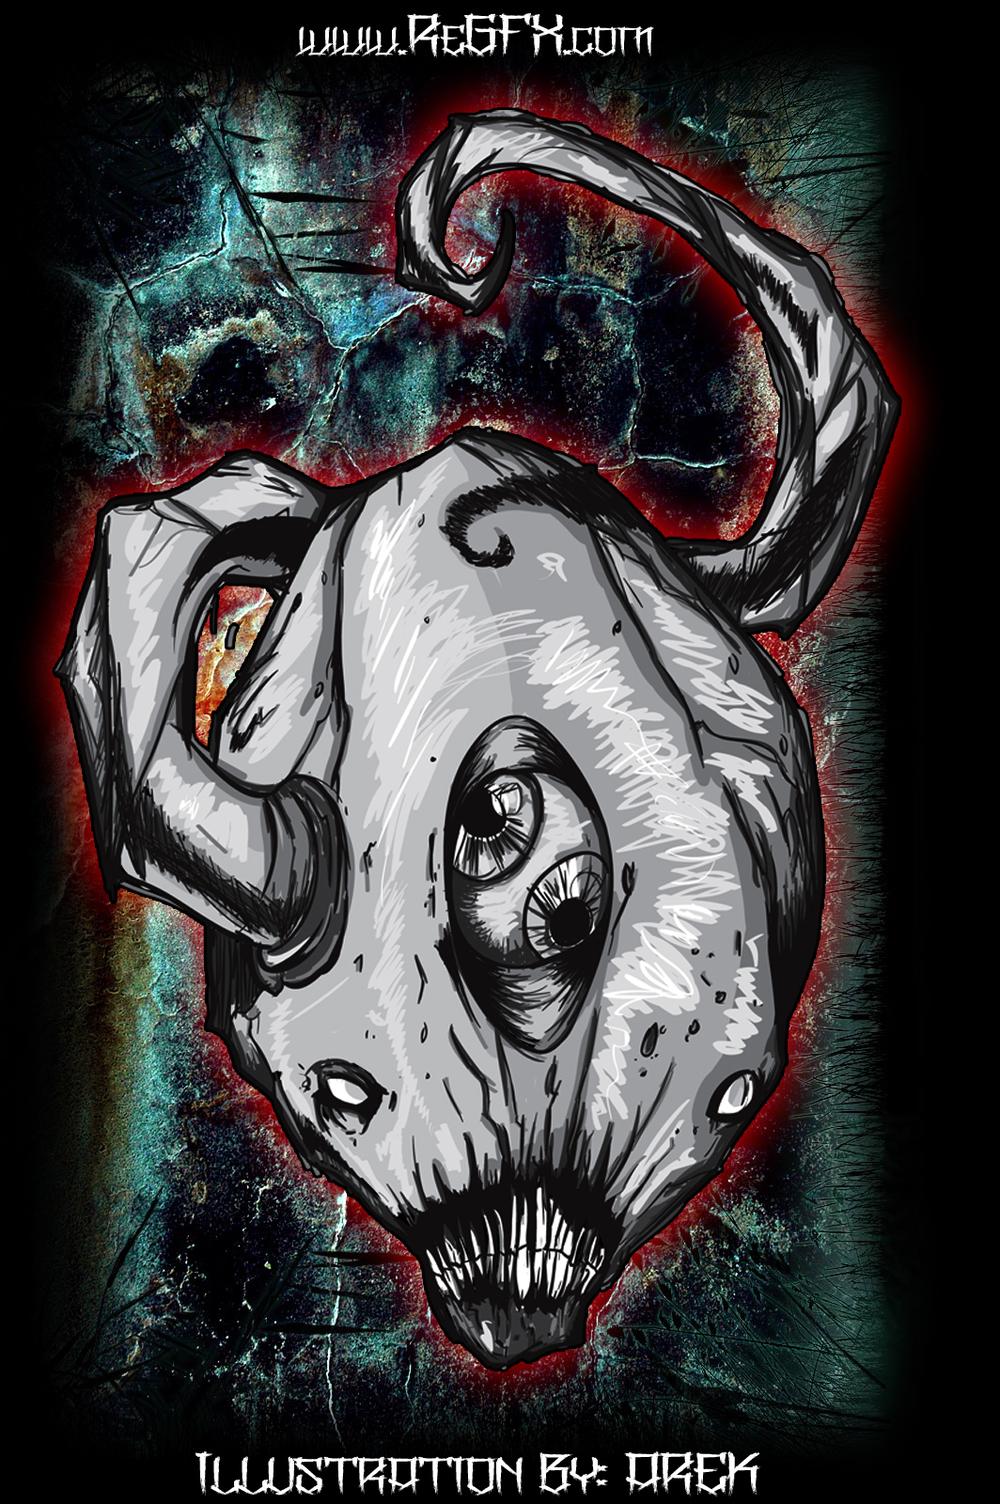 Arek---Regfx---Wicked-Alien-Skull---artowrk.jpg